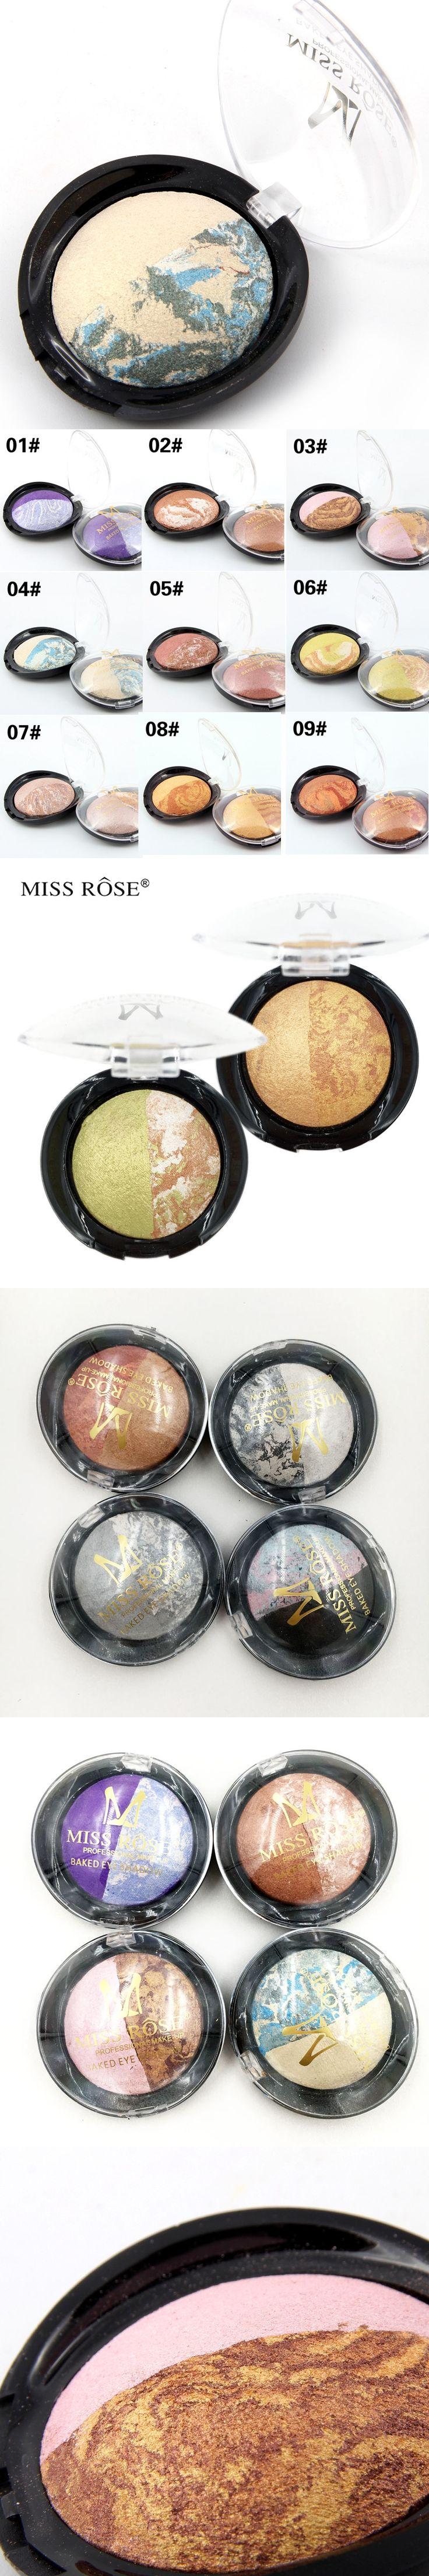 Miss rose brand natrul shimmer bake eyeshadow palette beautiful fashion Charm eye shadow pallete professional Makeup